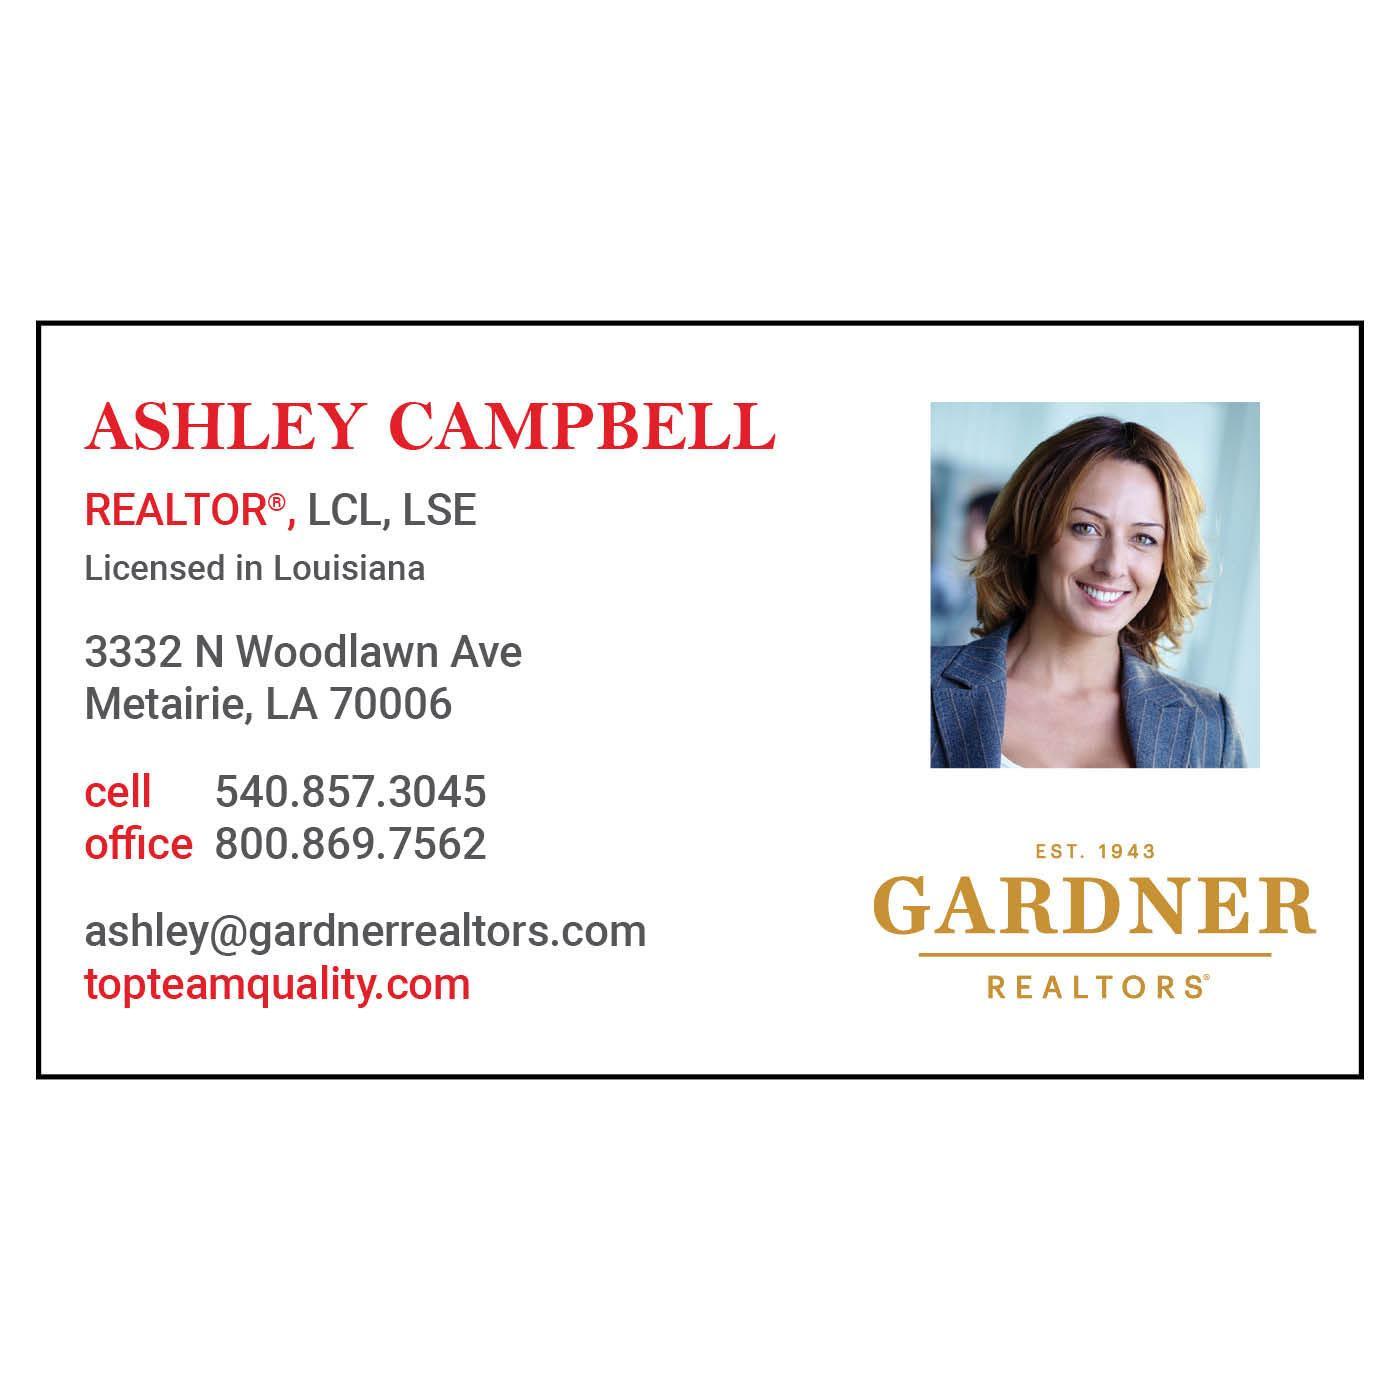 Gardner Realtors business card